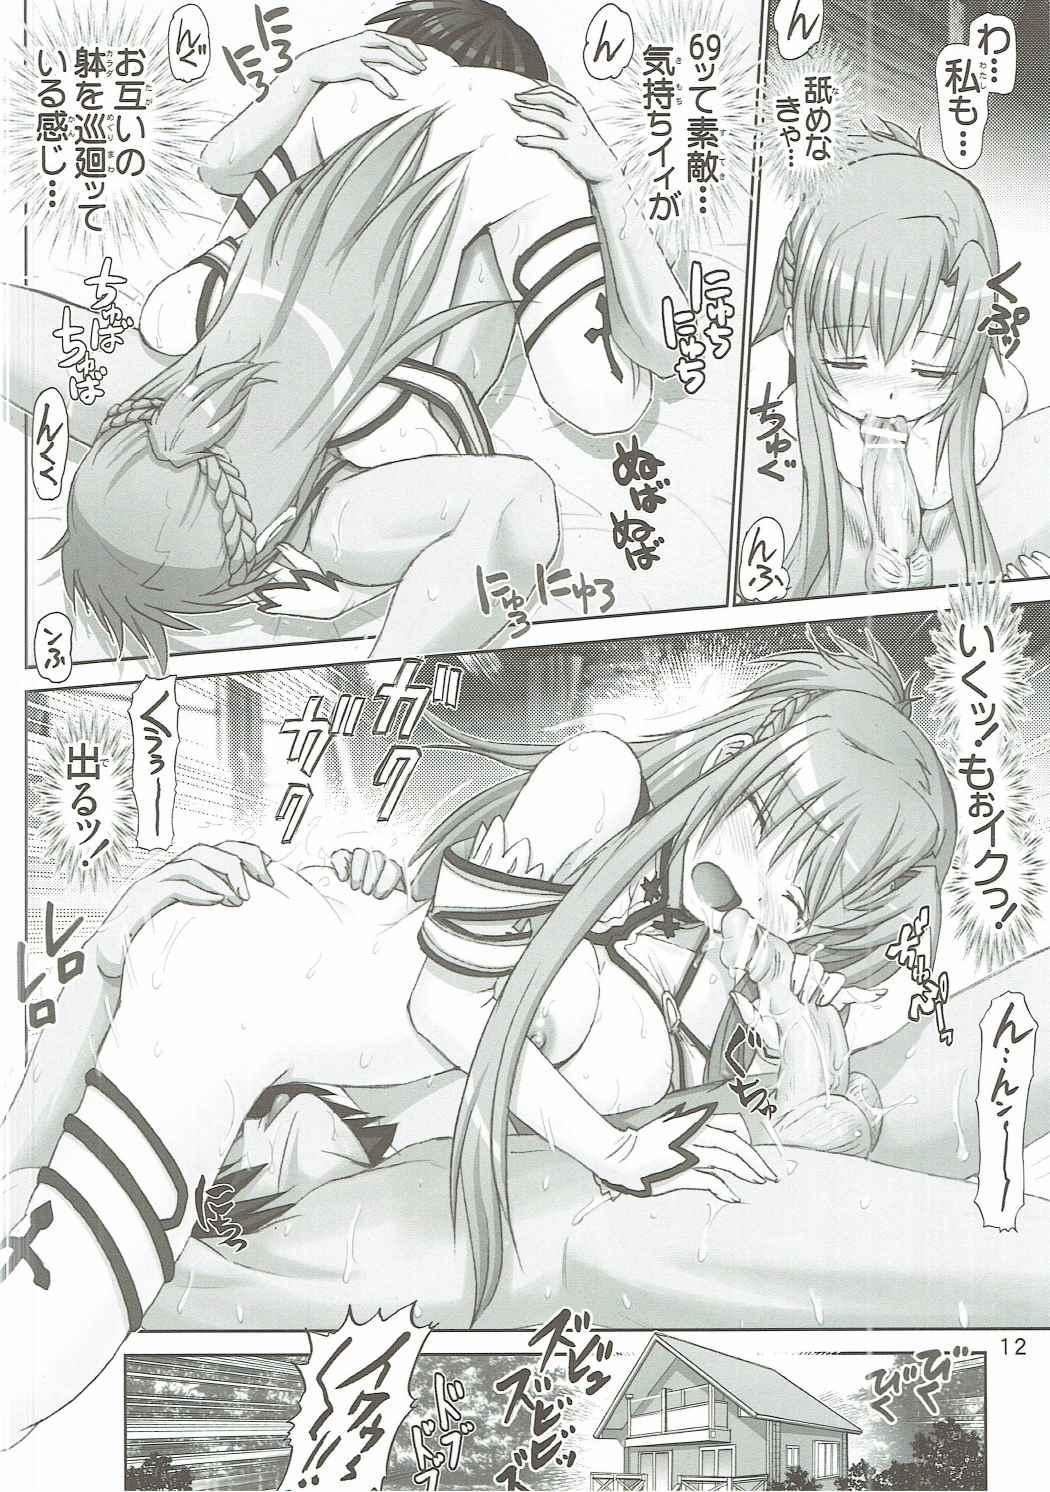 Sword Tsuma Asuna - The wife equipped with a sword, ASUNA 10